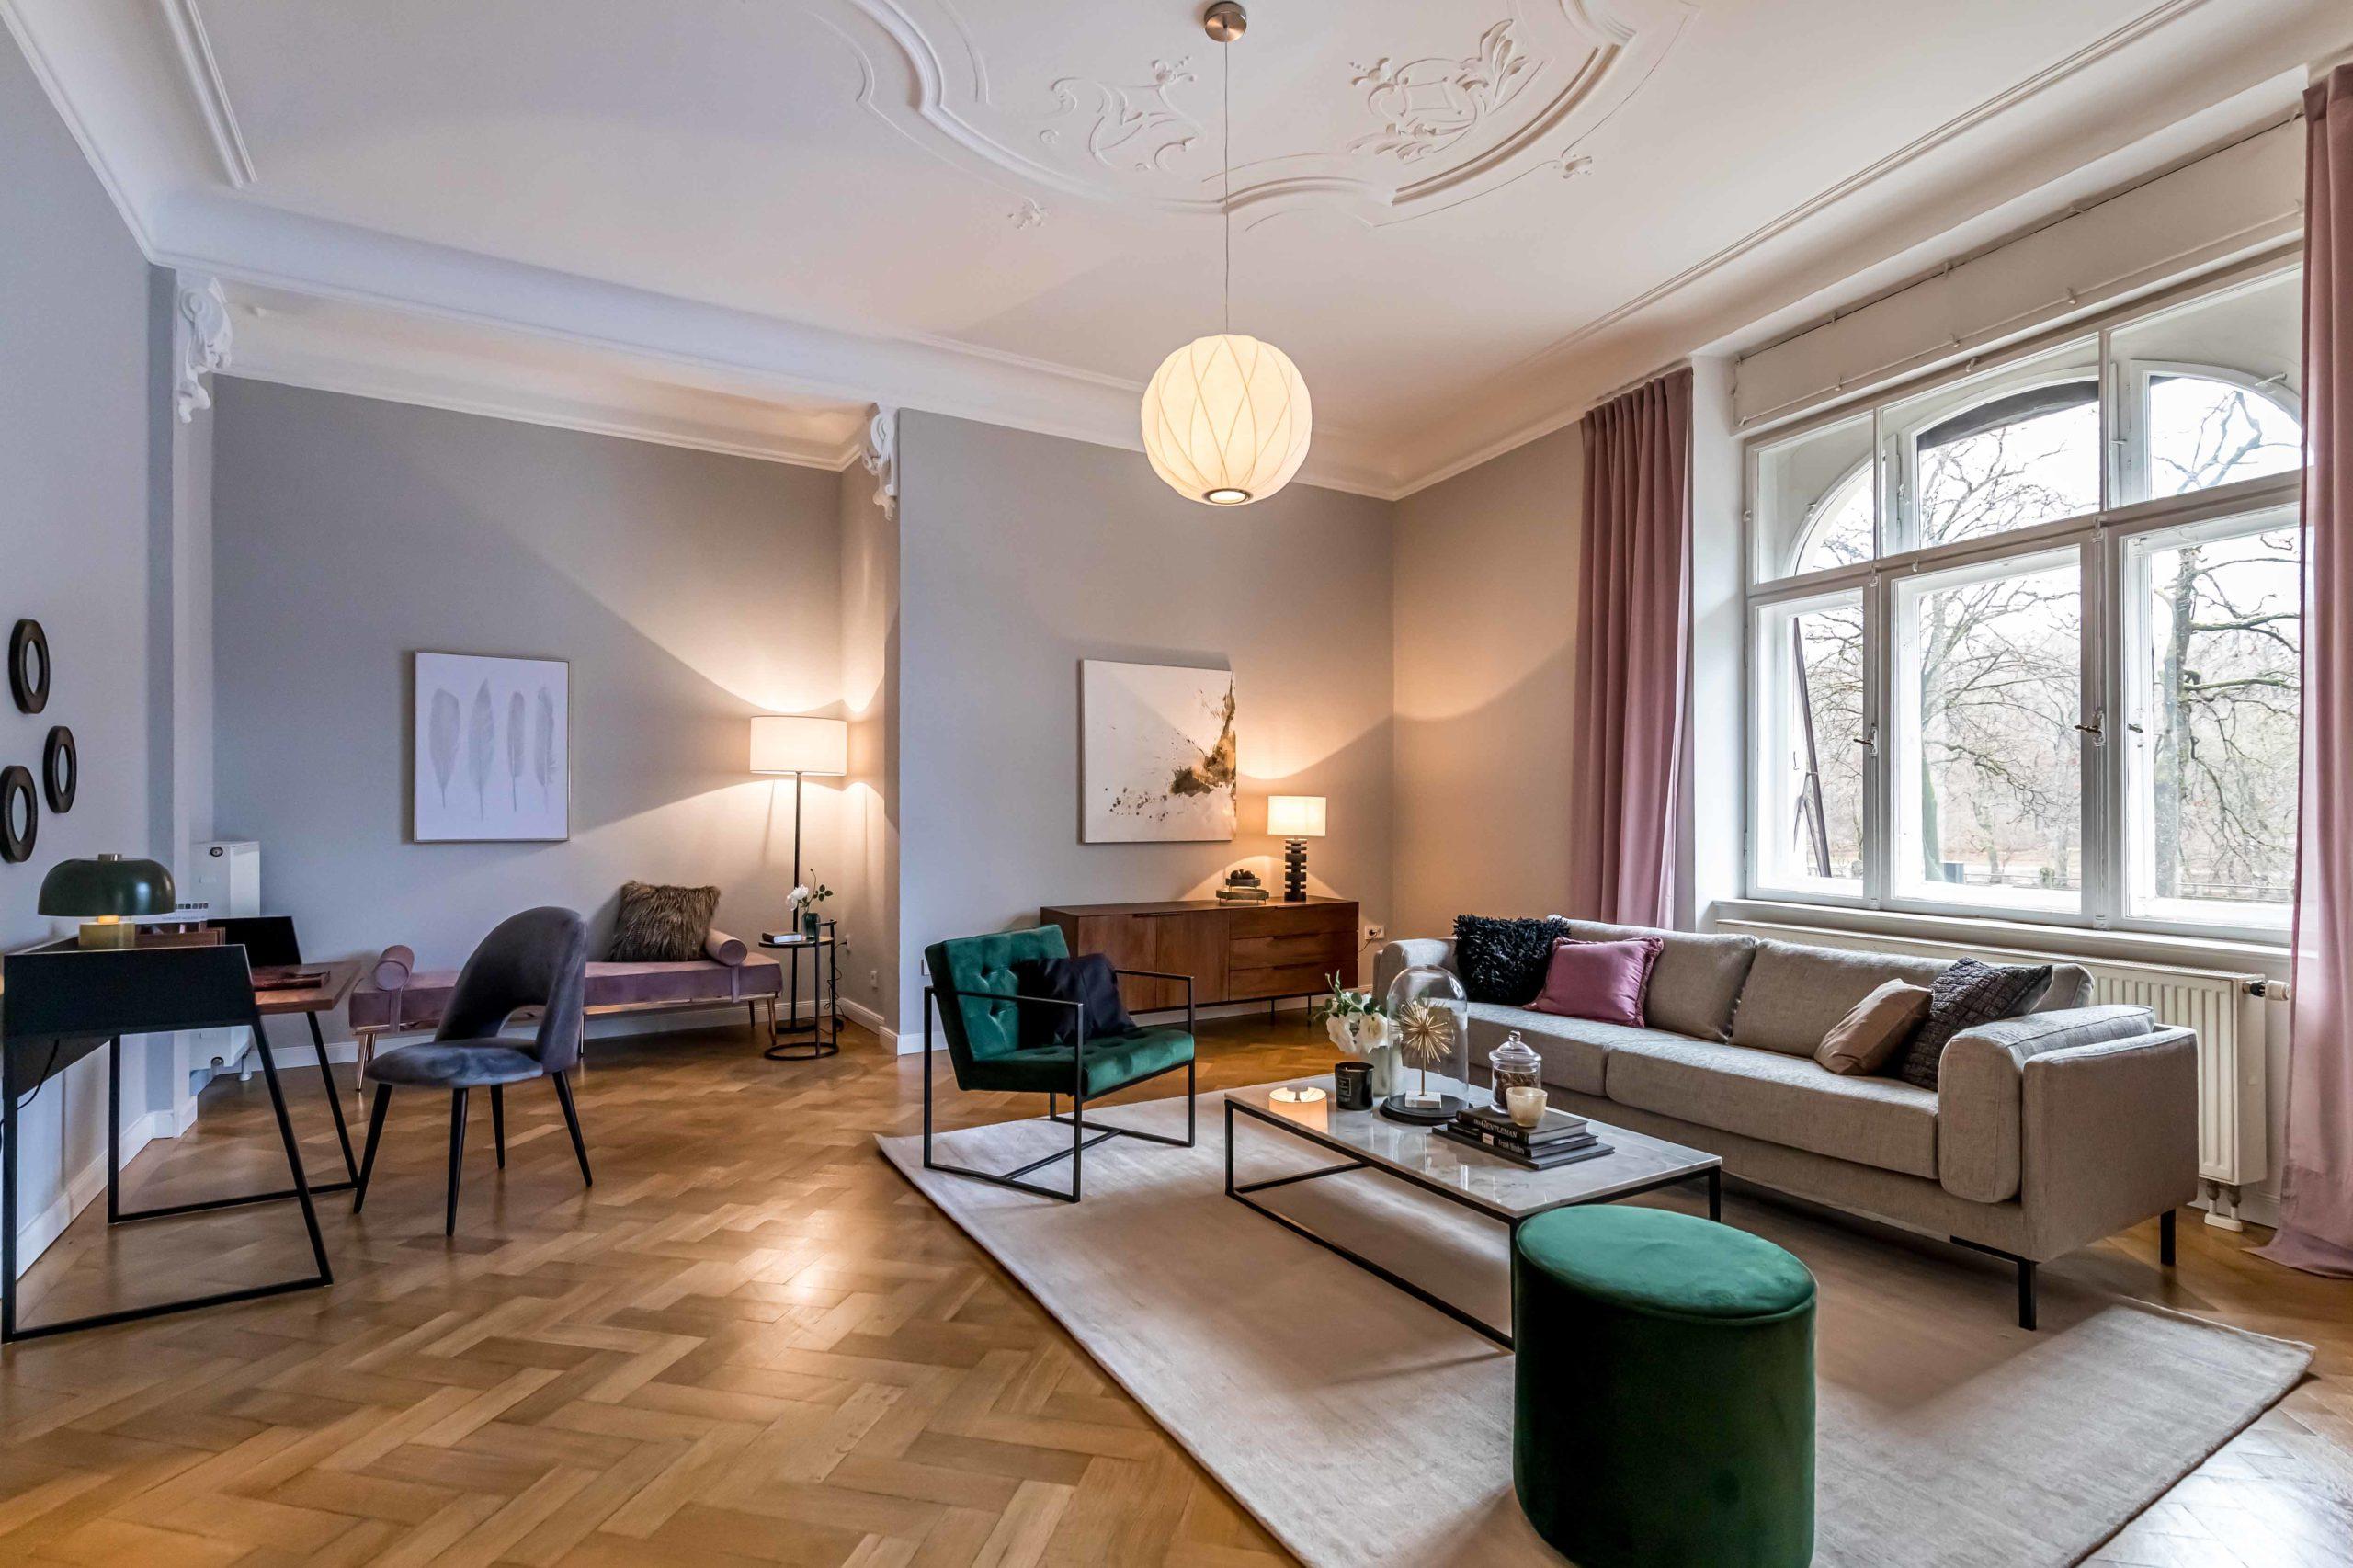 Immobilienfotografie München-anja-richter-fotografie ETW Widenmayerstr. 8 EG-23